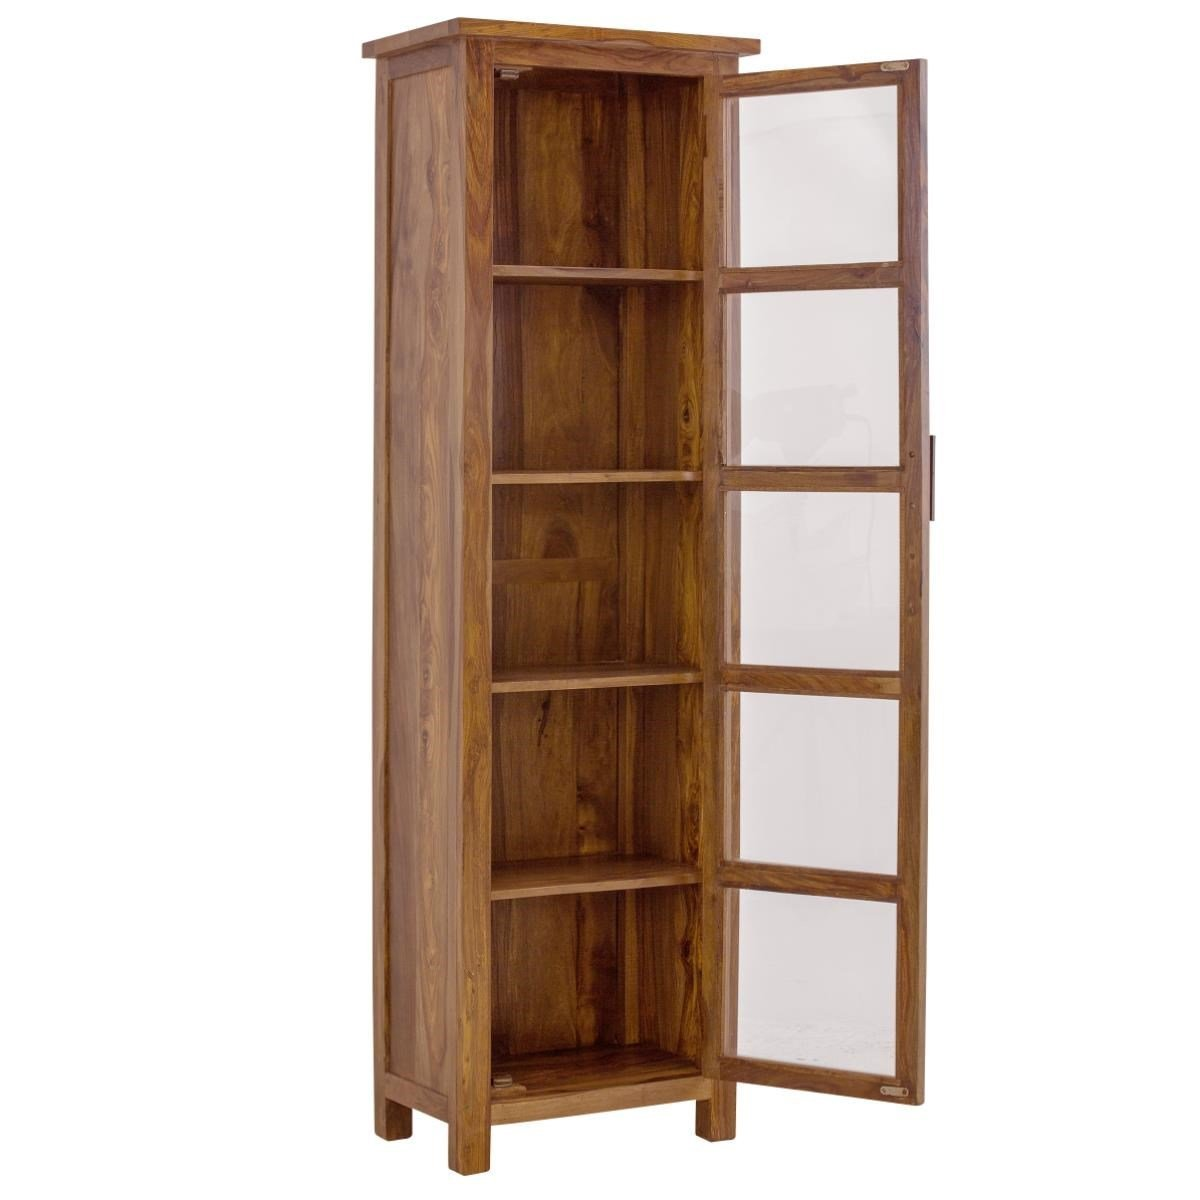 Naturehood Tall Cupboard for Living Room Crockery Unit 100